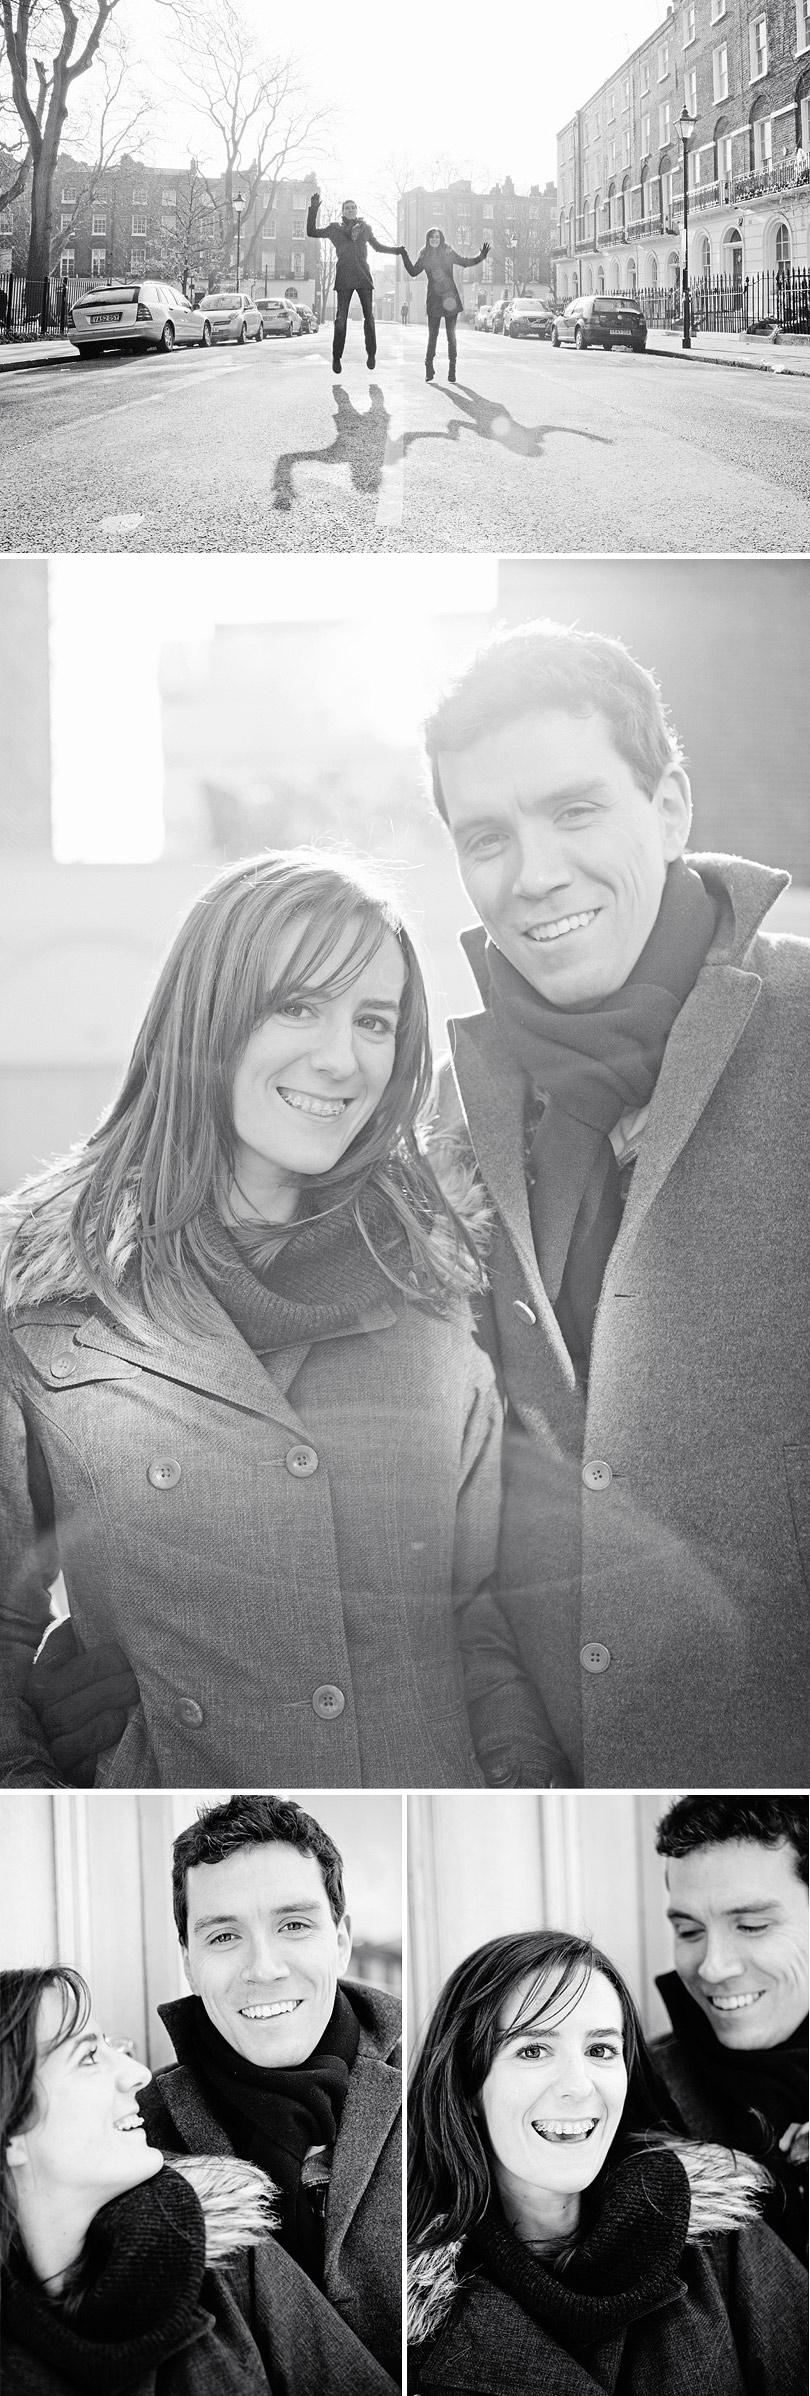 Carly&IanBL_6.jpg